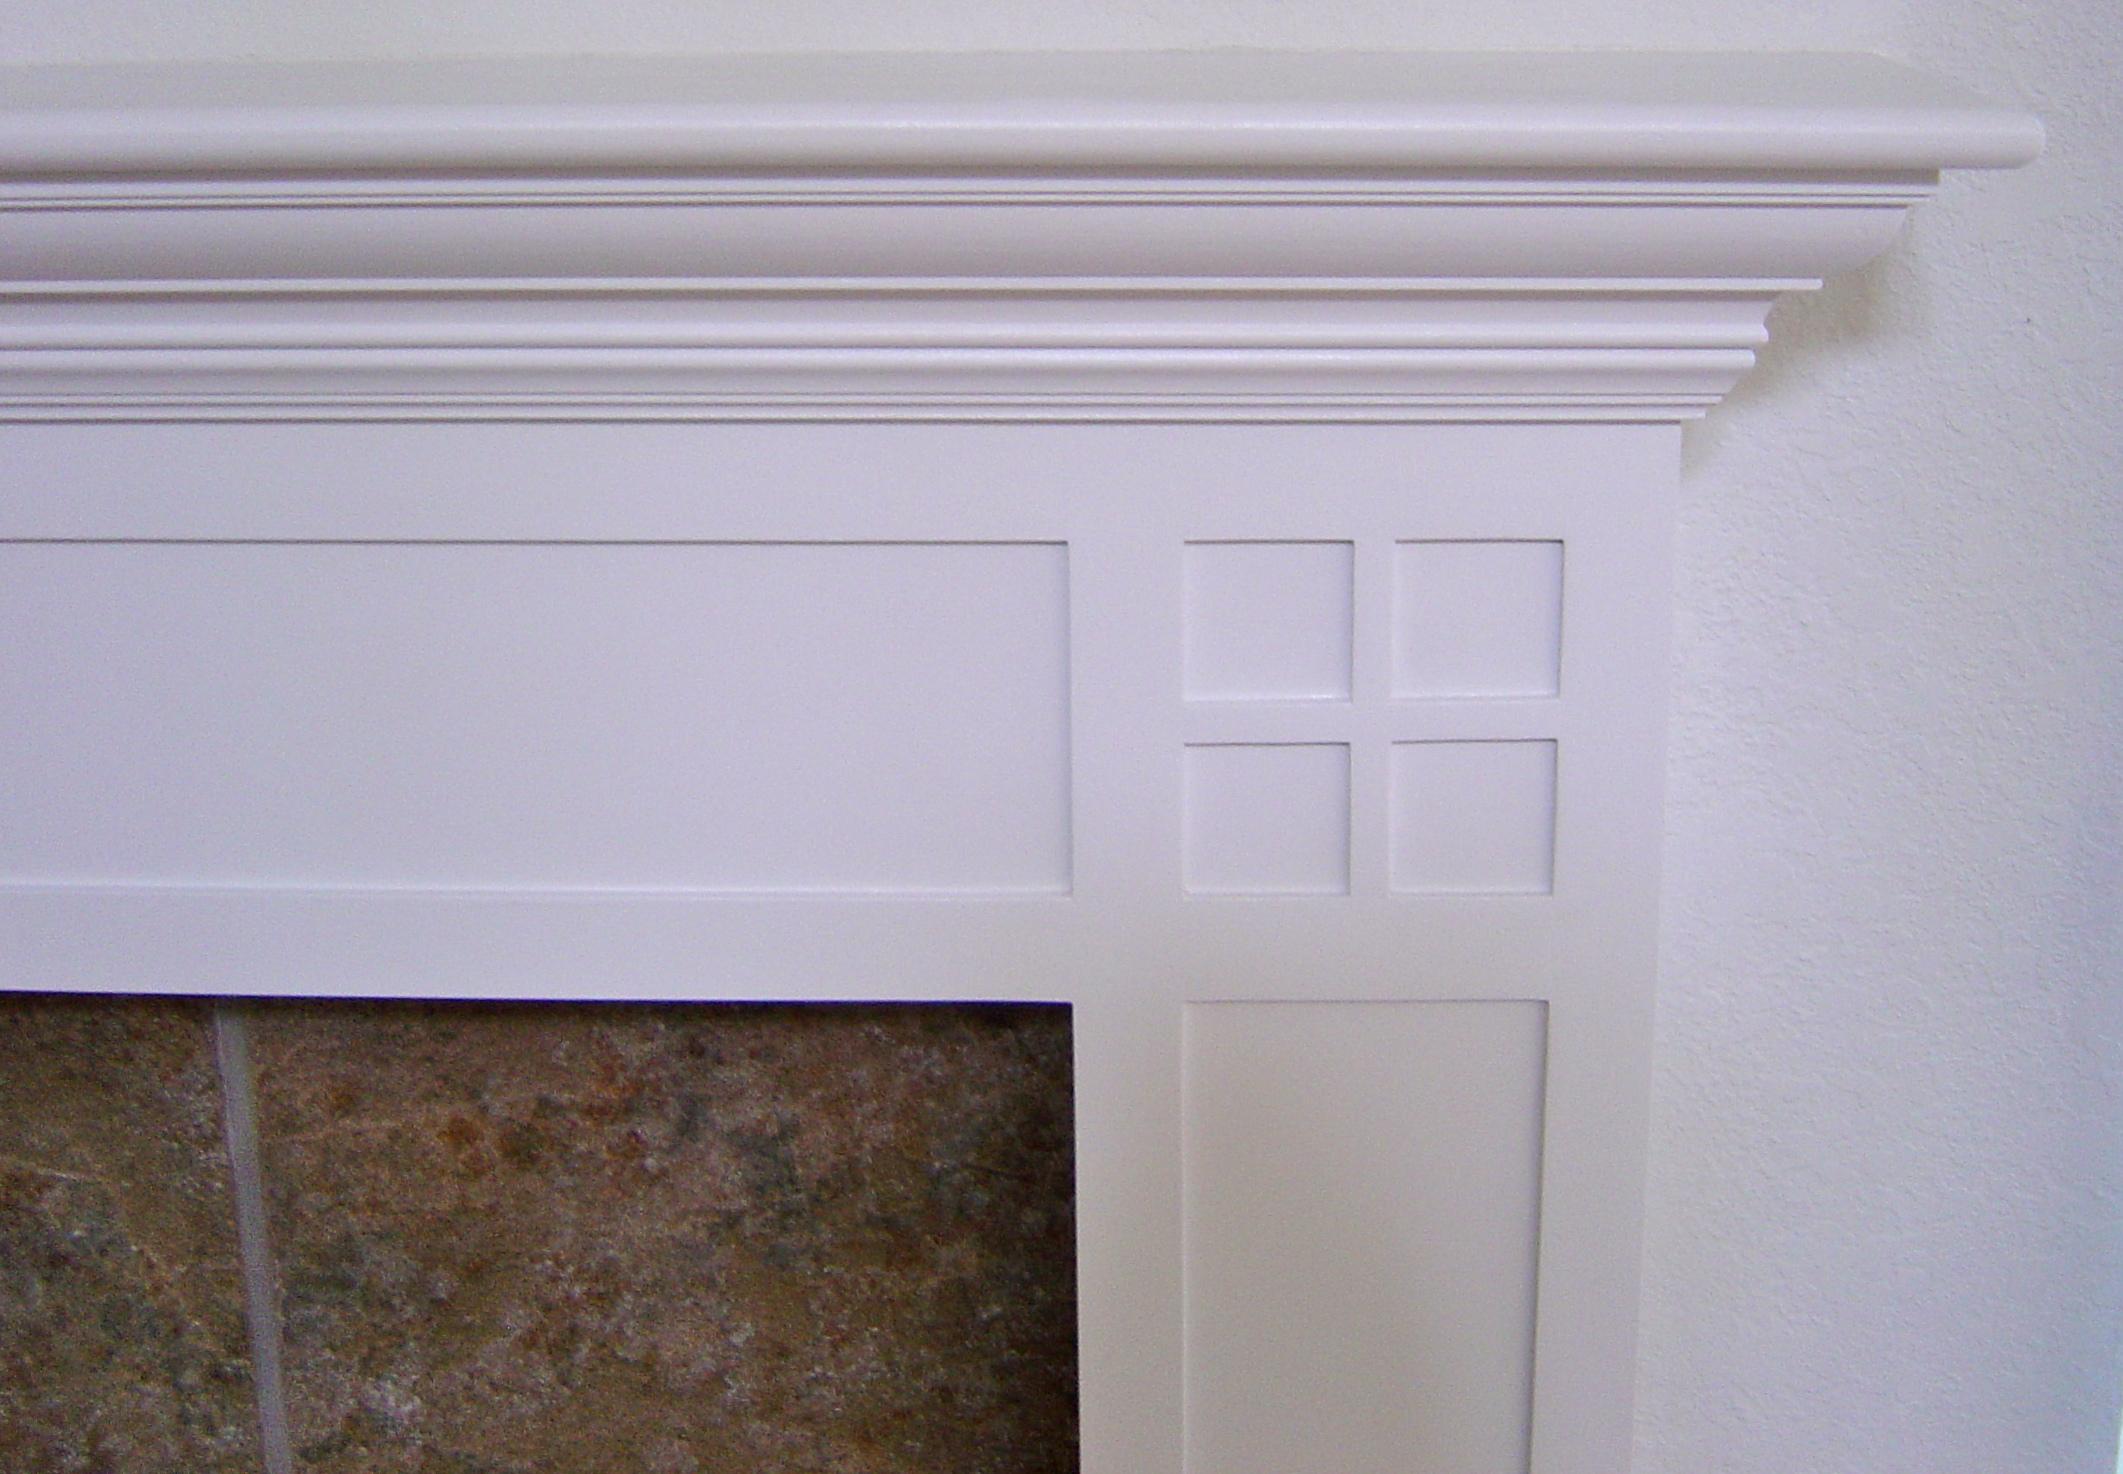 Craftsman style fireplace mantel - Fireplace Mantel Rainford Restorations